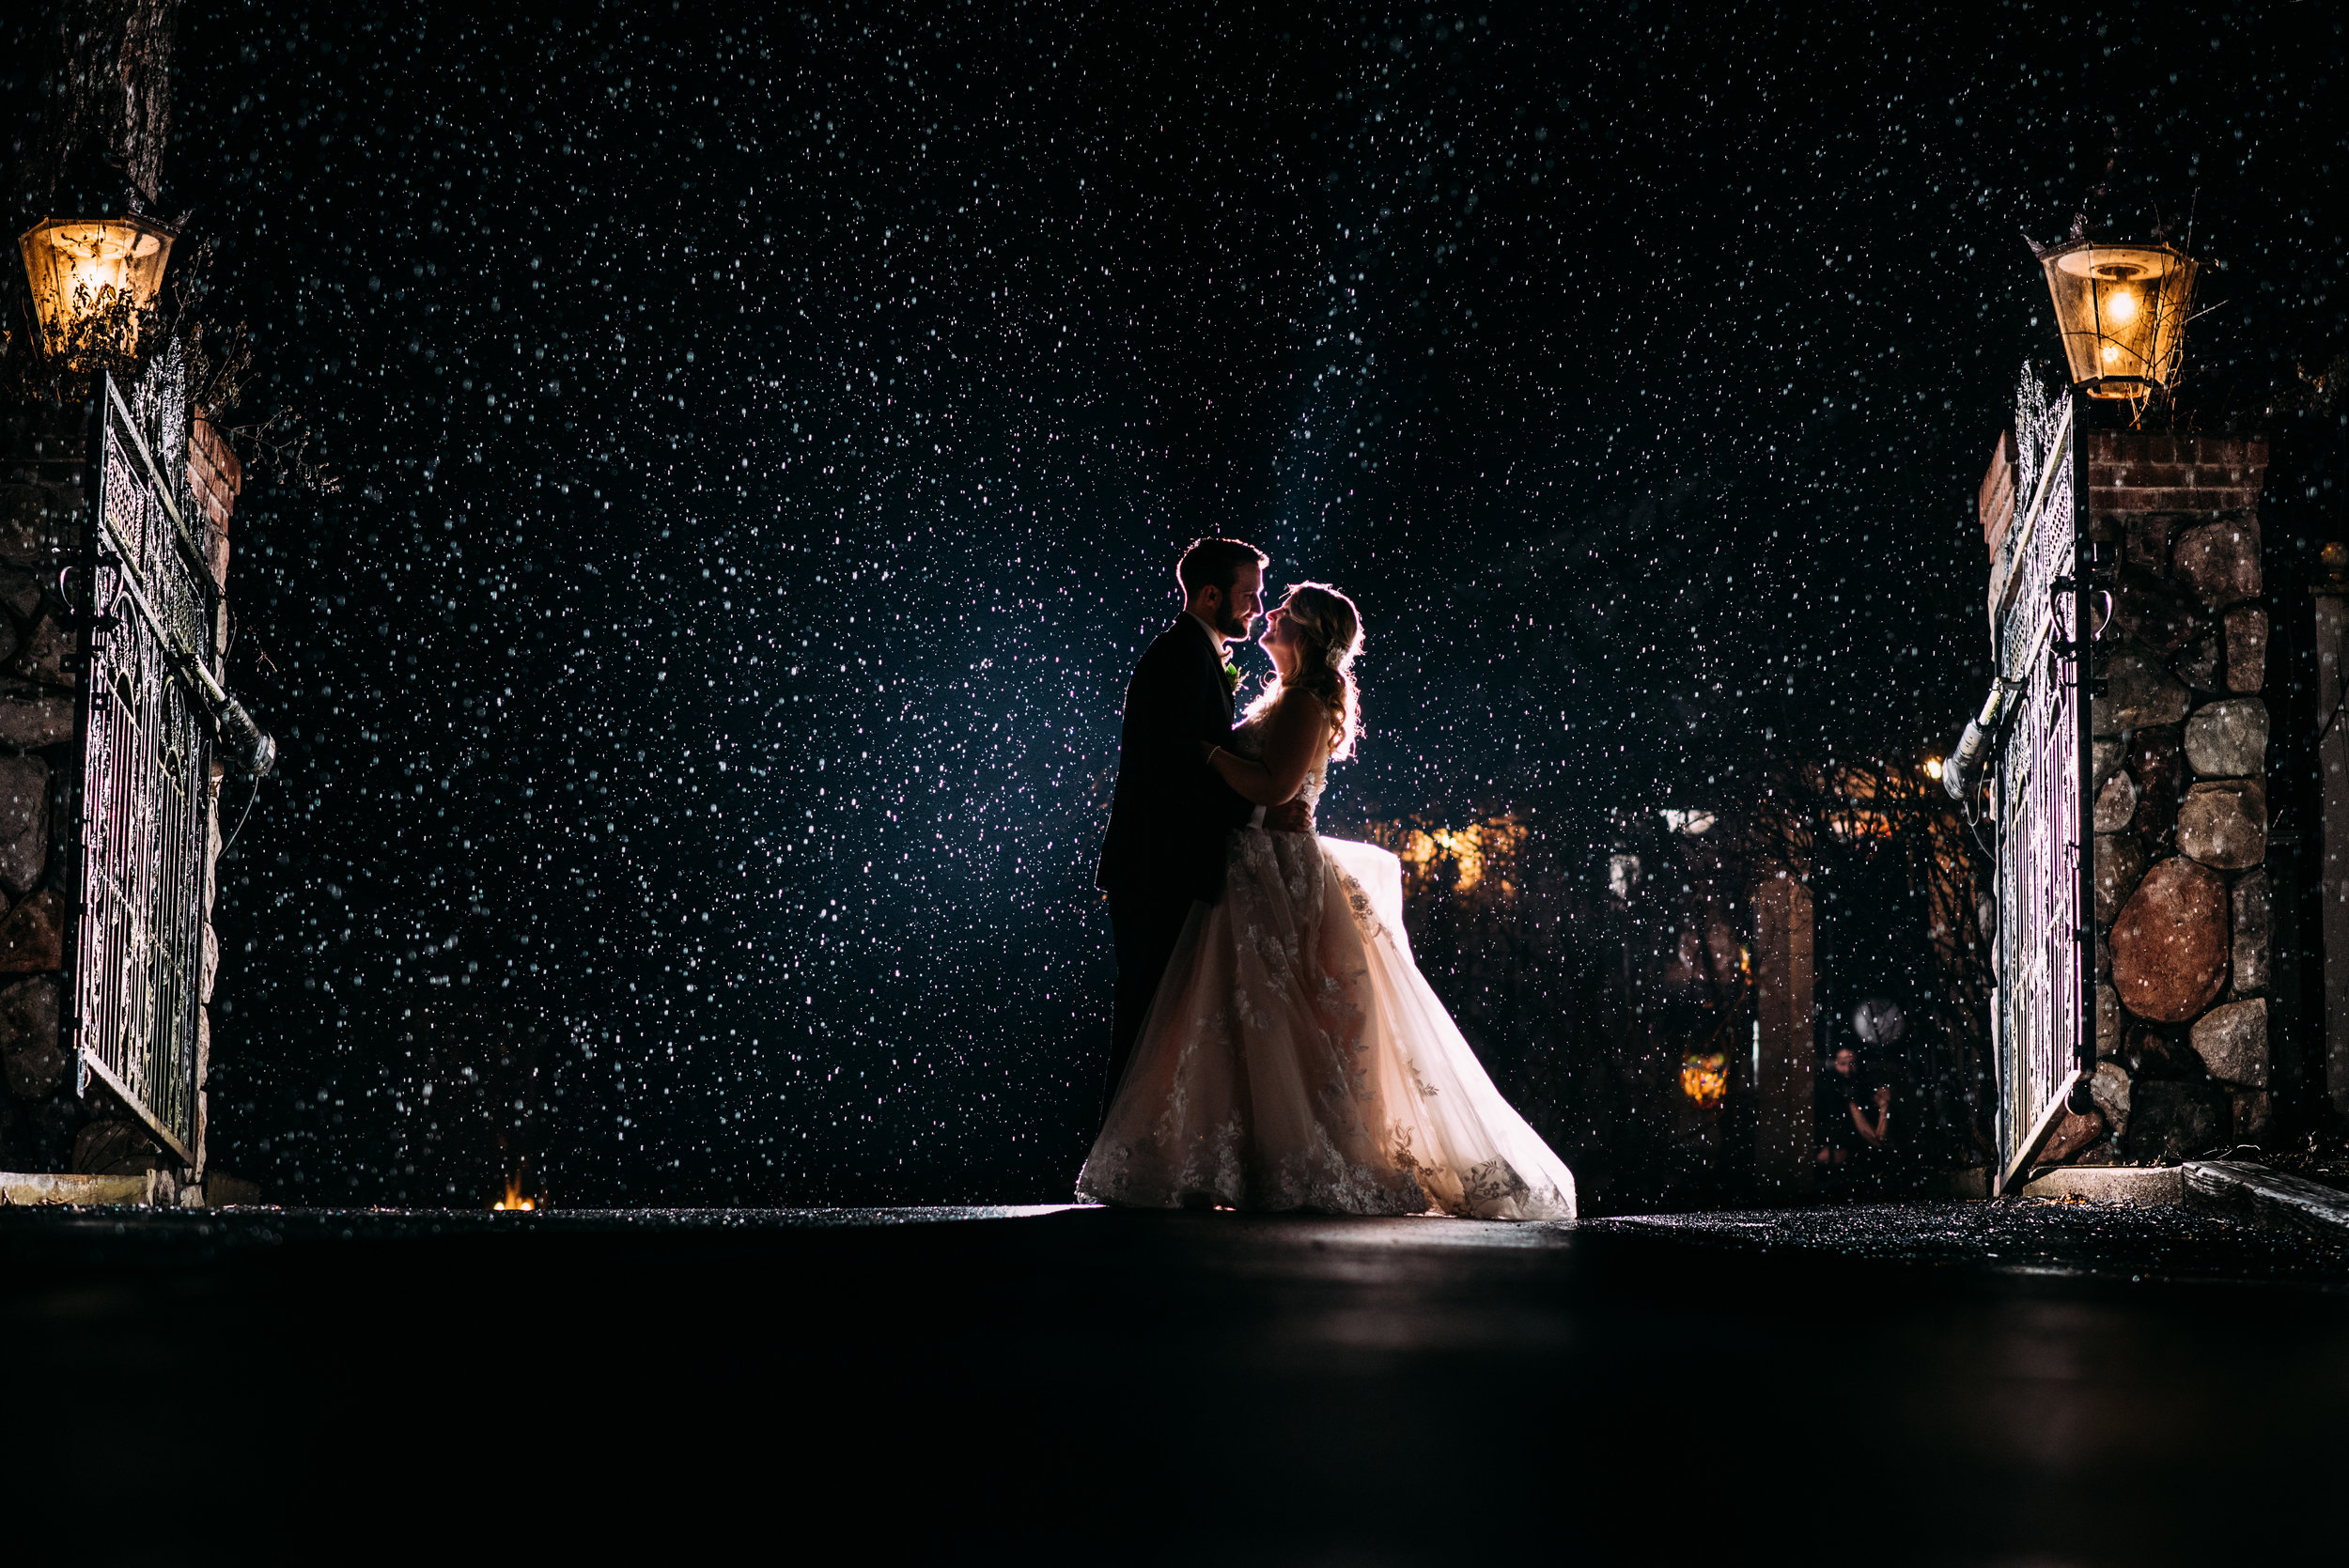 WeddingPhotos | NJPhotographer | Highlights-19-4.jpg